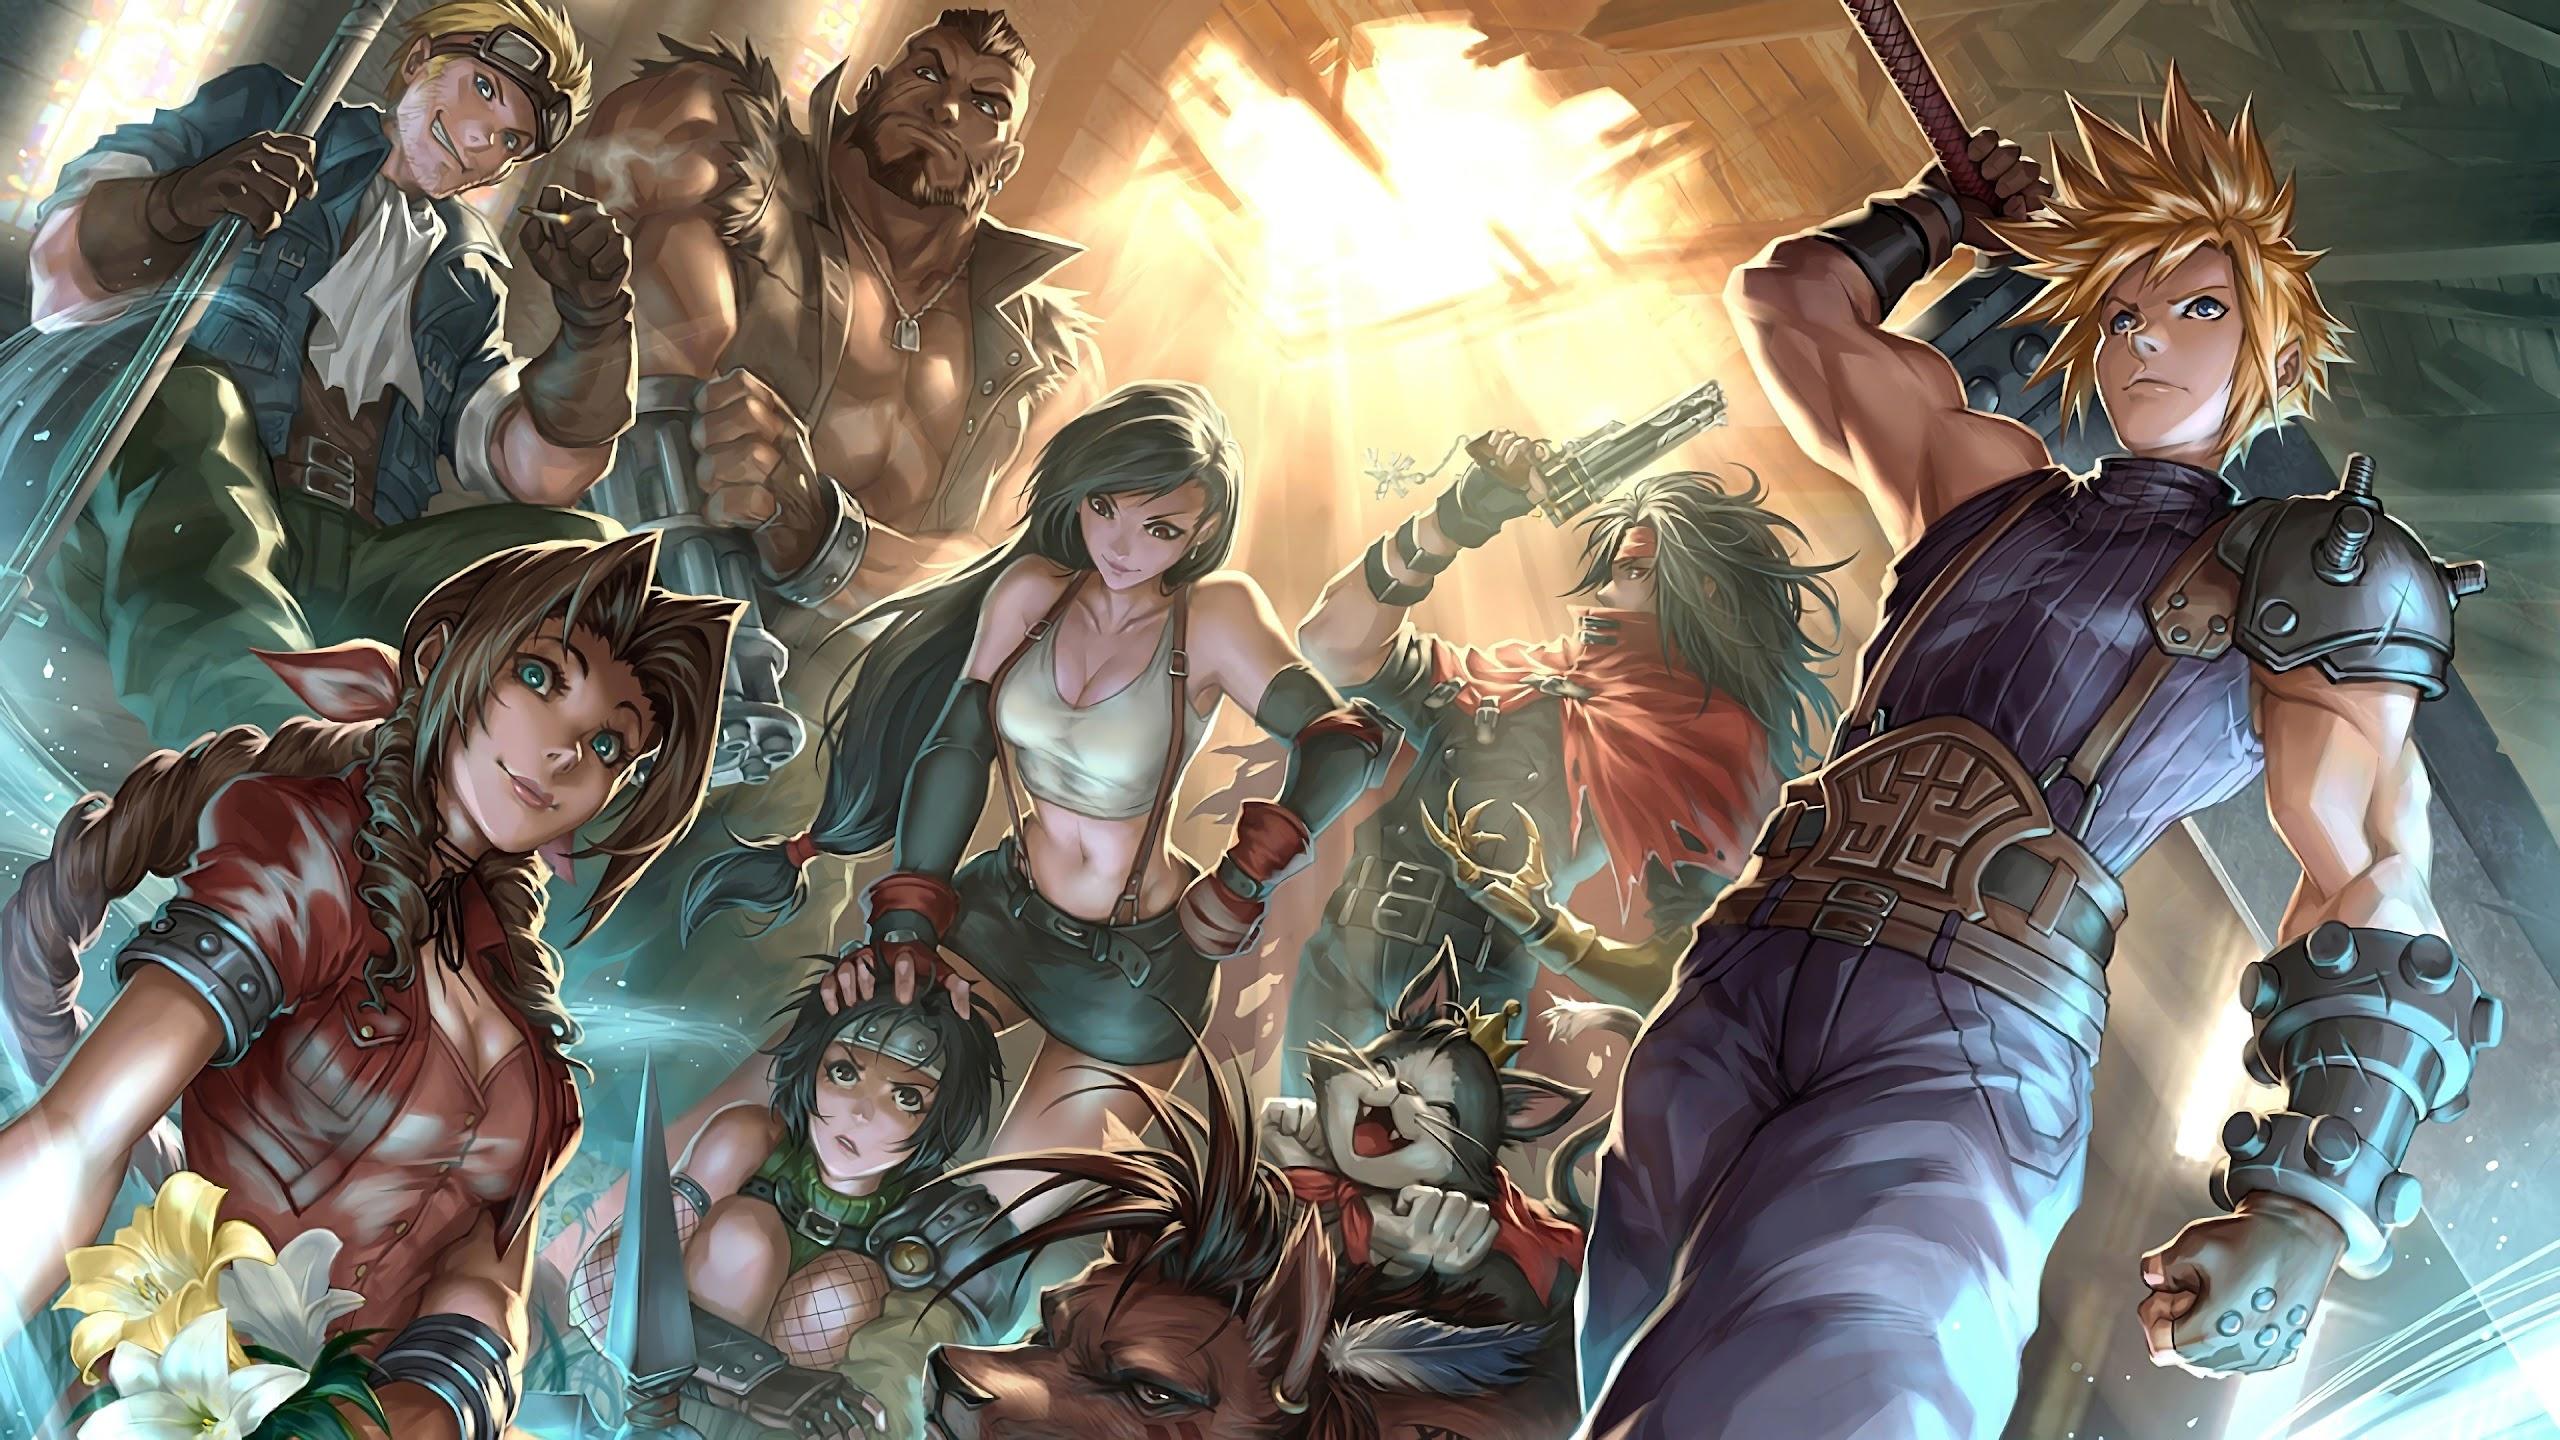 final fantasy 7 remake characters uhdpaper.com 4K 40